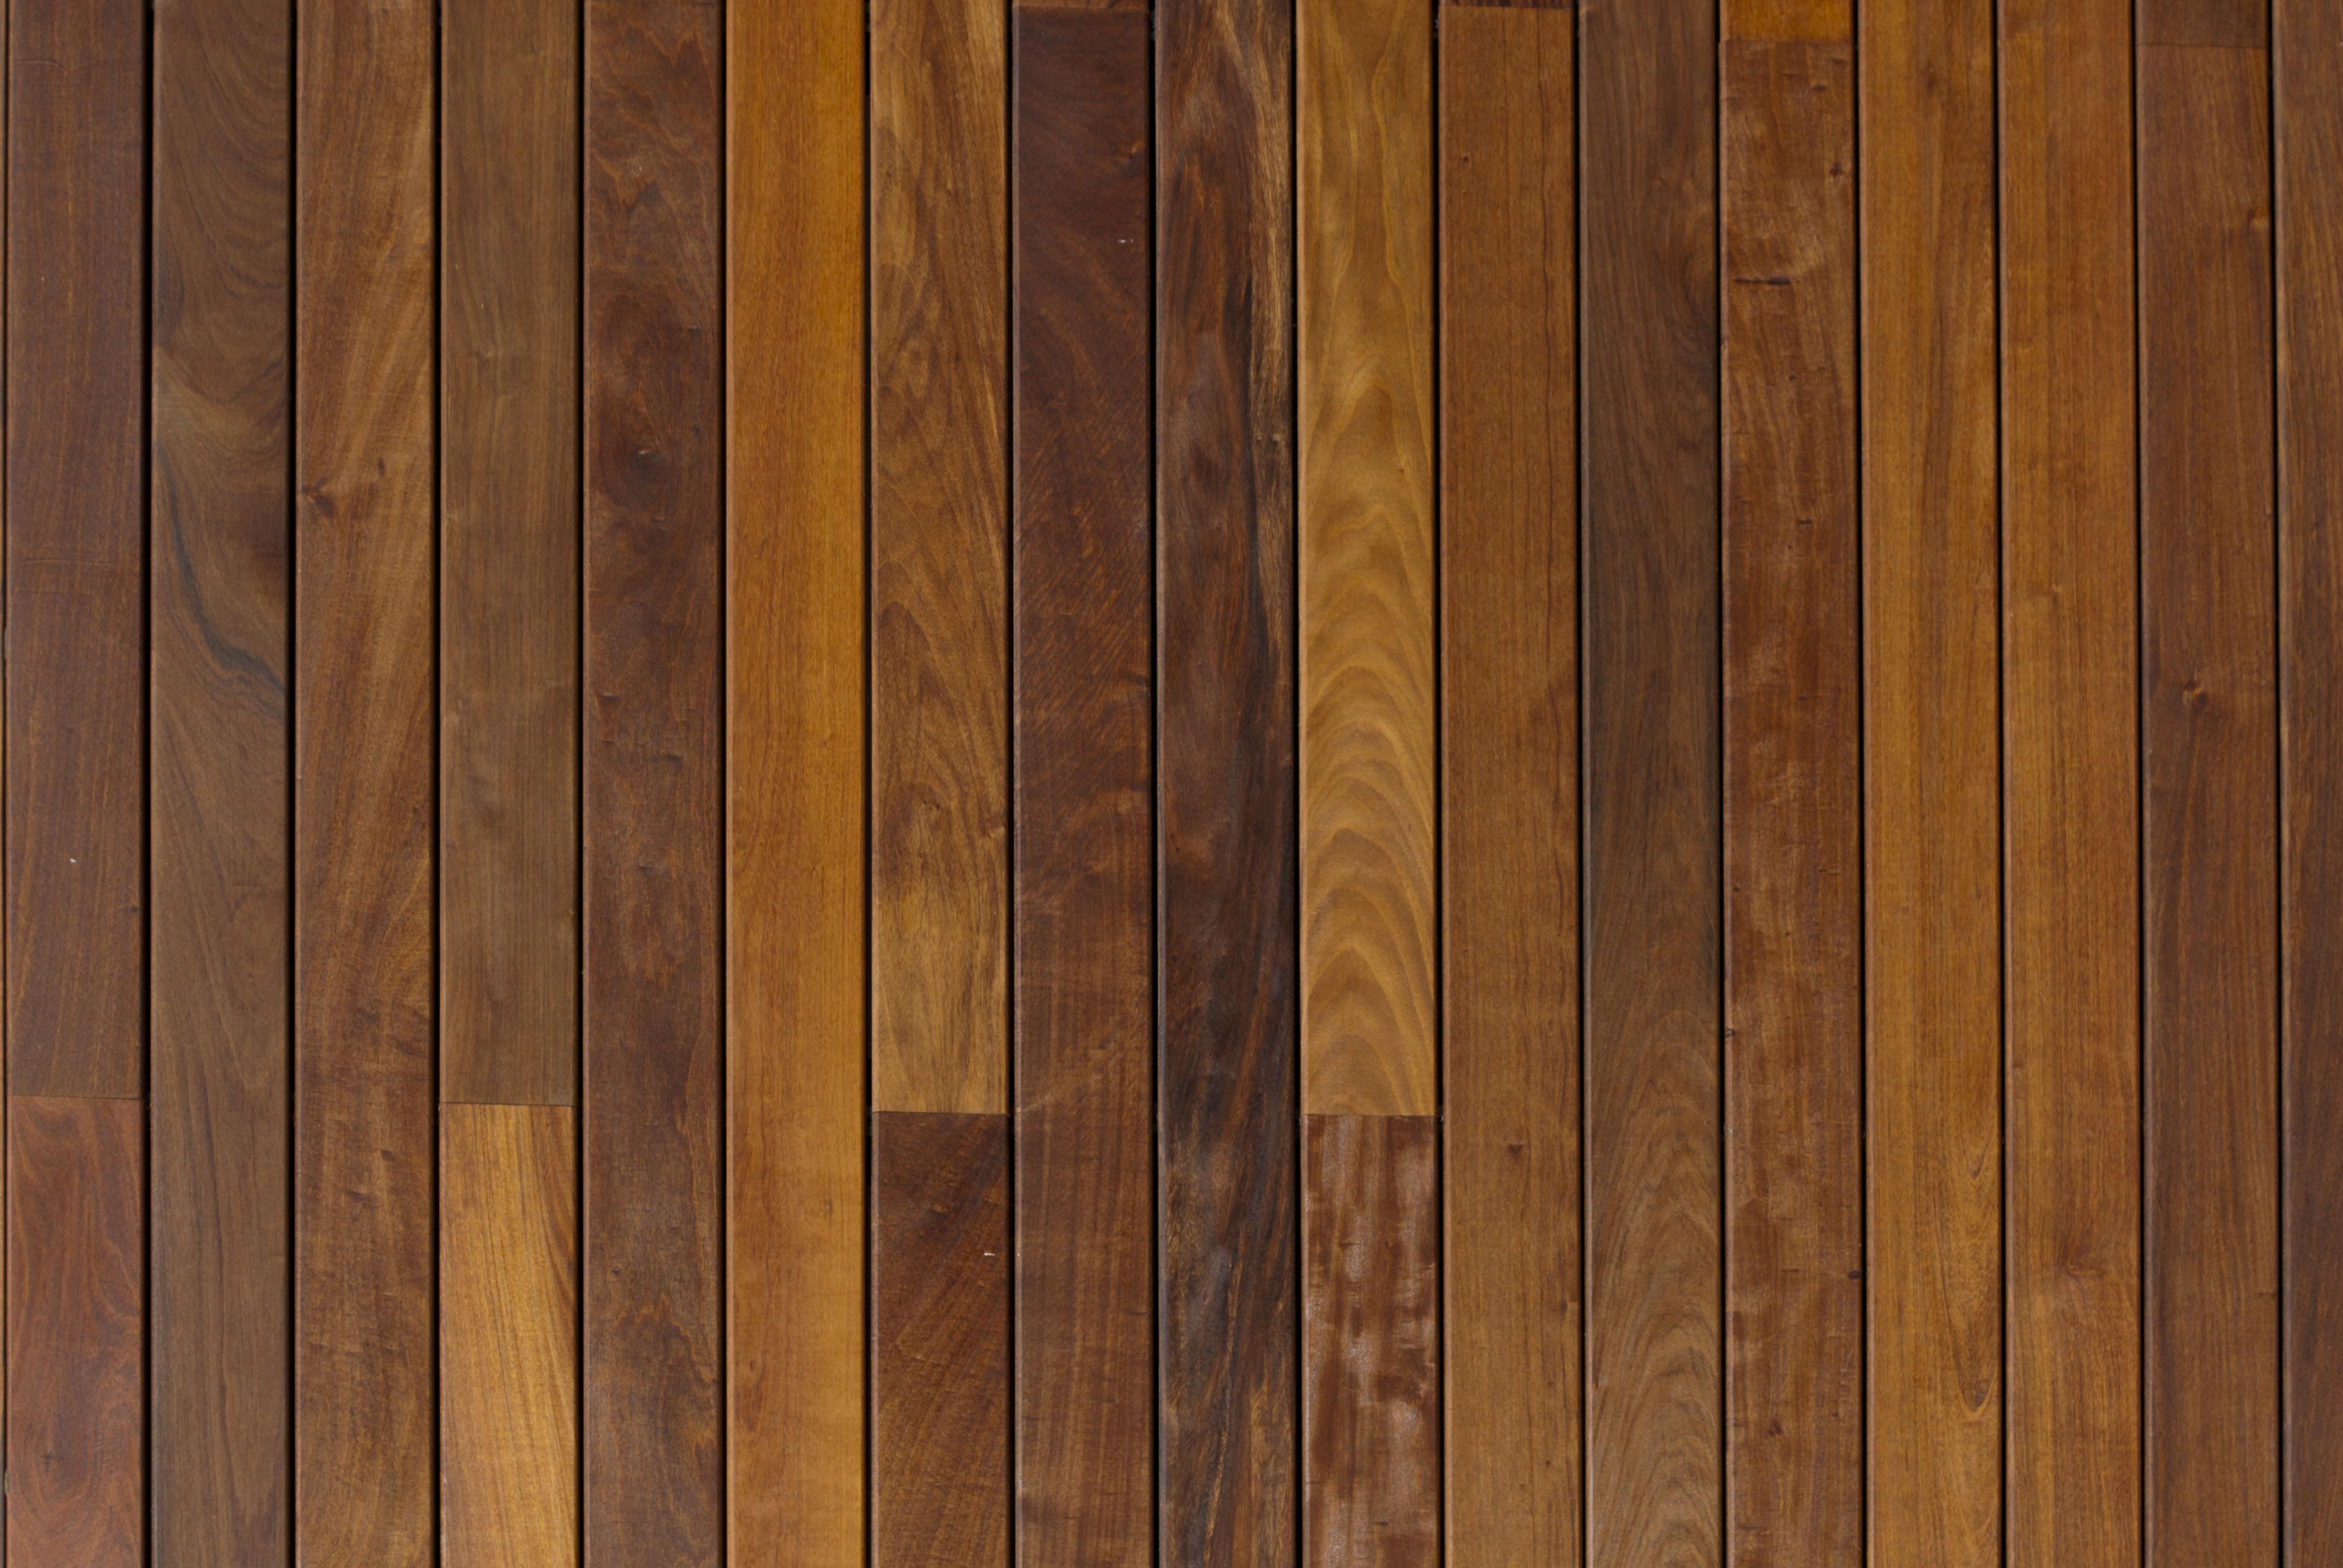 Ipe madera exterior ideas de disenos - Tarimas de madera para exterior ...